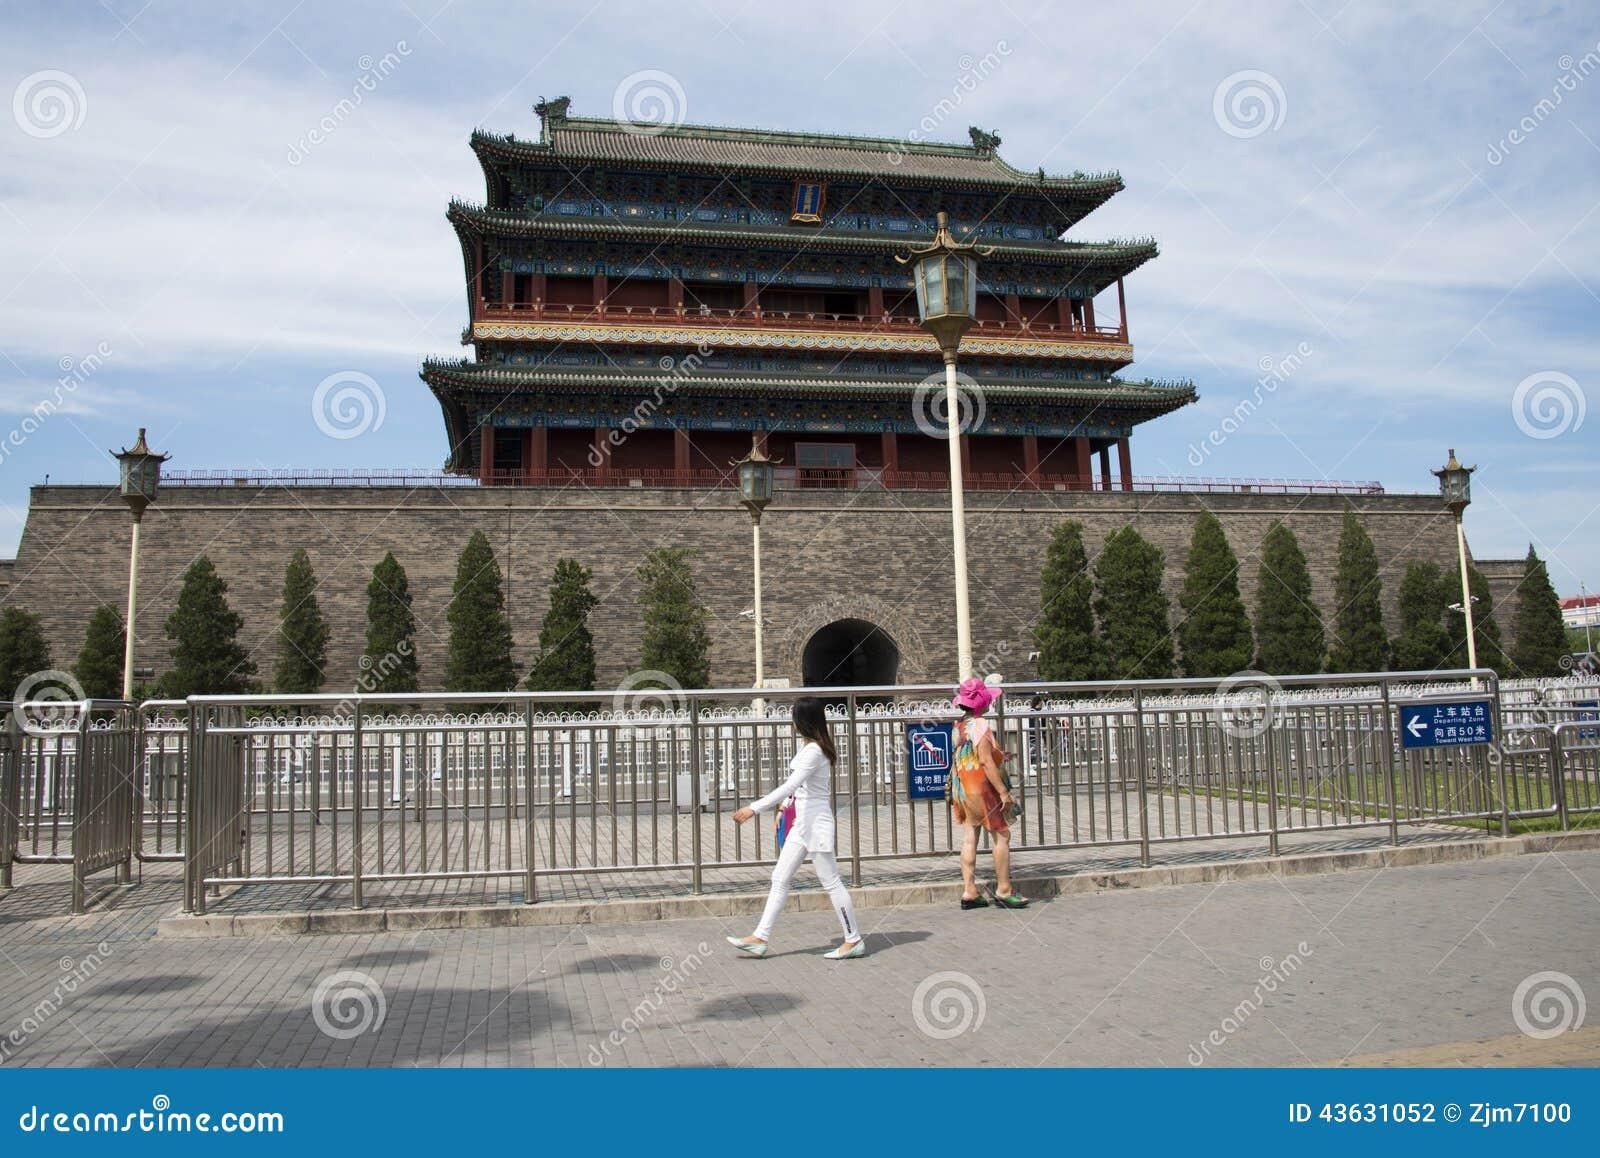 asiatique chine p kin porte de zhengyang porte photographie ditorial image 43631052. Black Bedroom Furniture Sets. Home Design Ideas